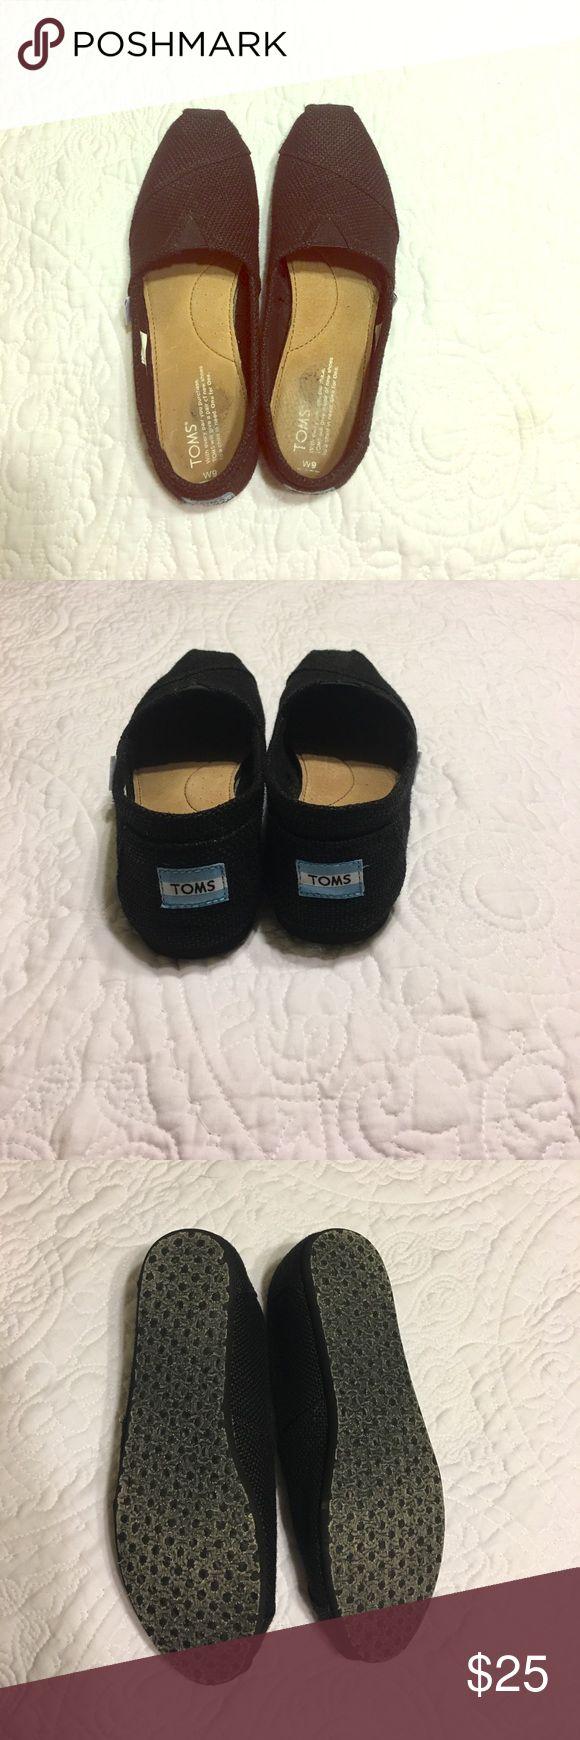 Toms black canvas shoes Excellent used condition toms size 9 women's black canvas shoes. Worn two times. In great condition. TOMS Shoes